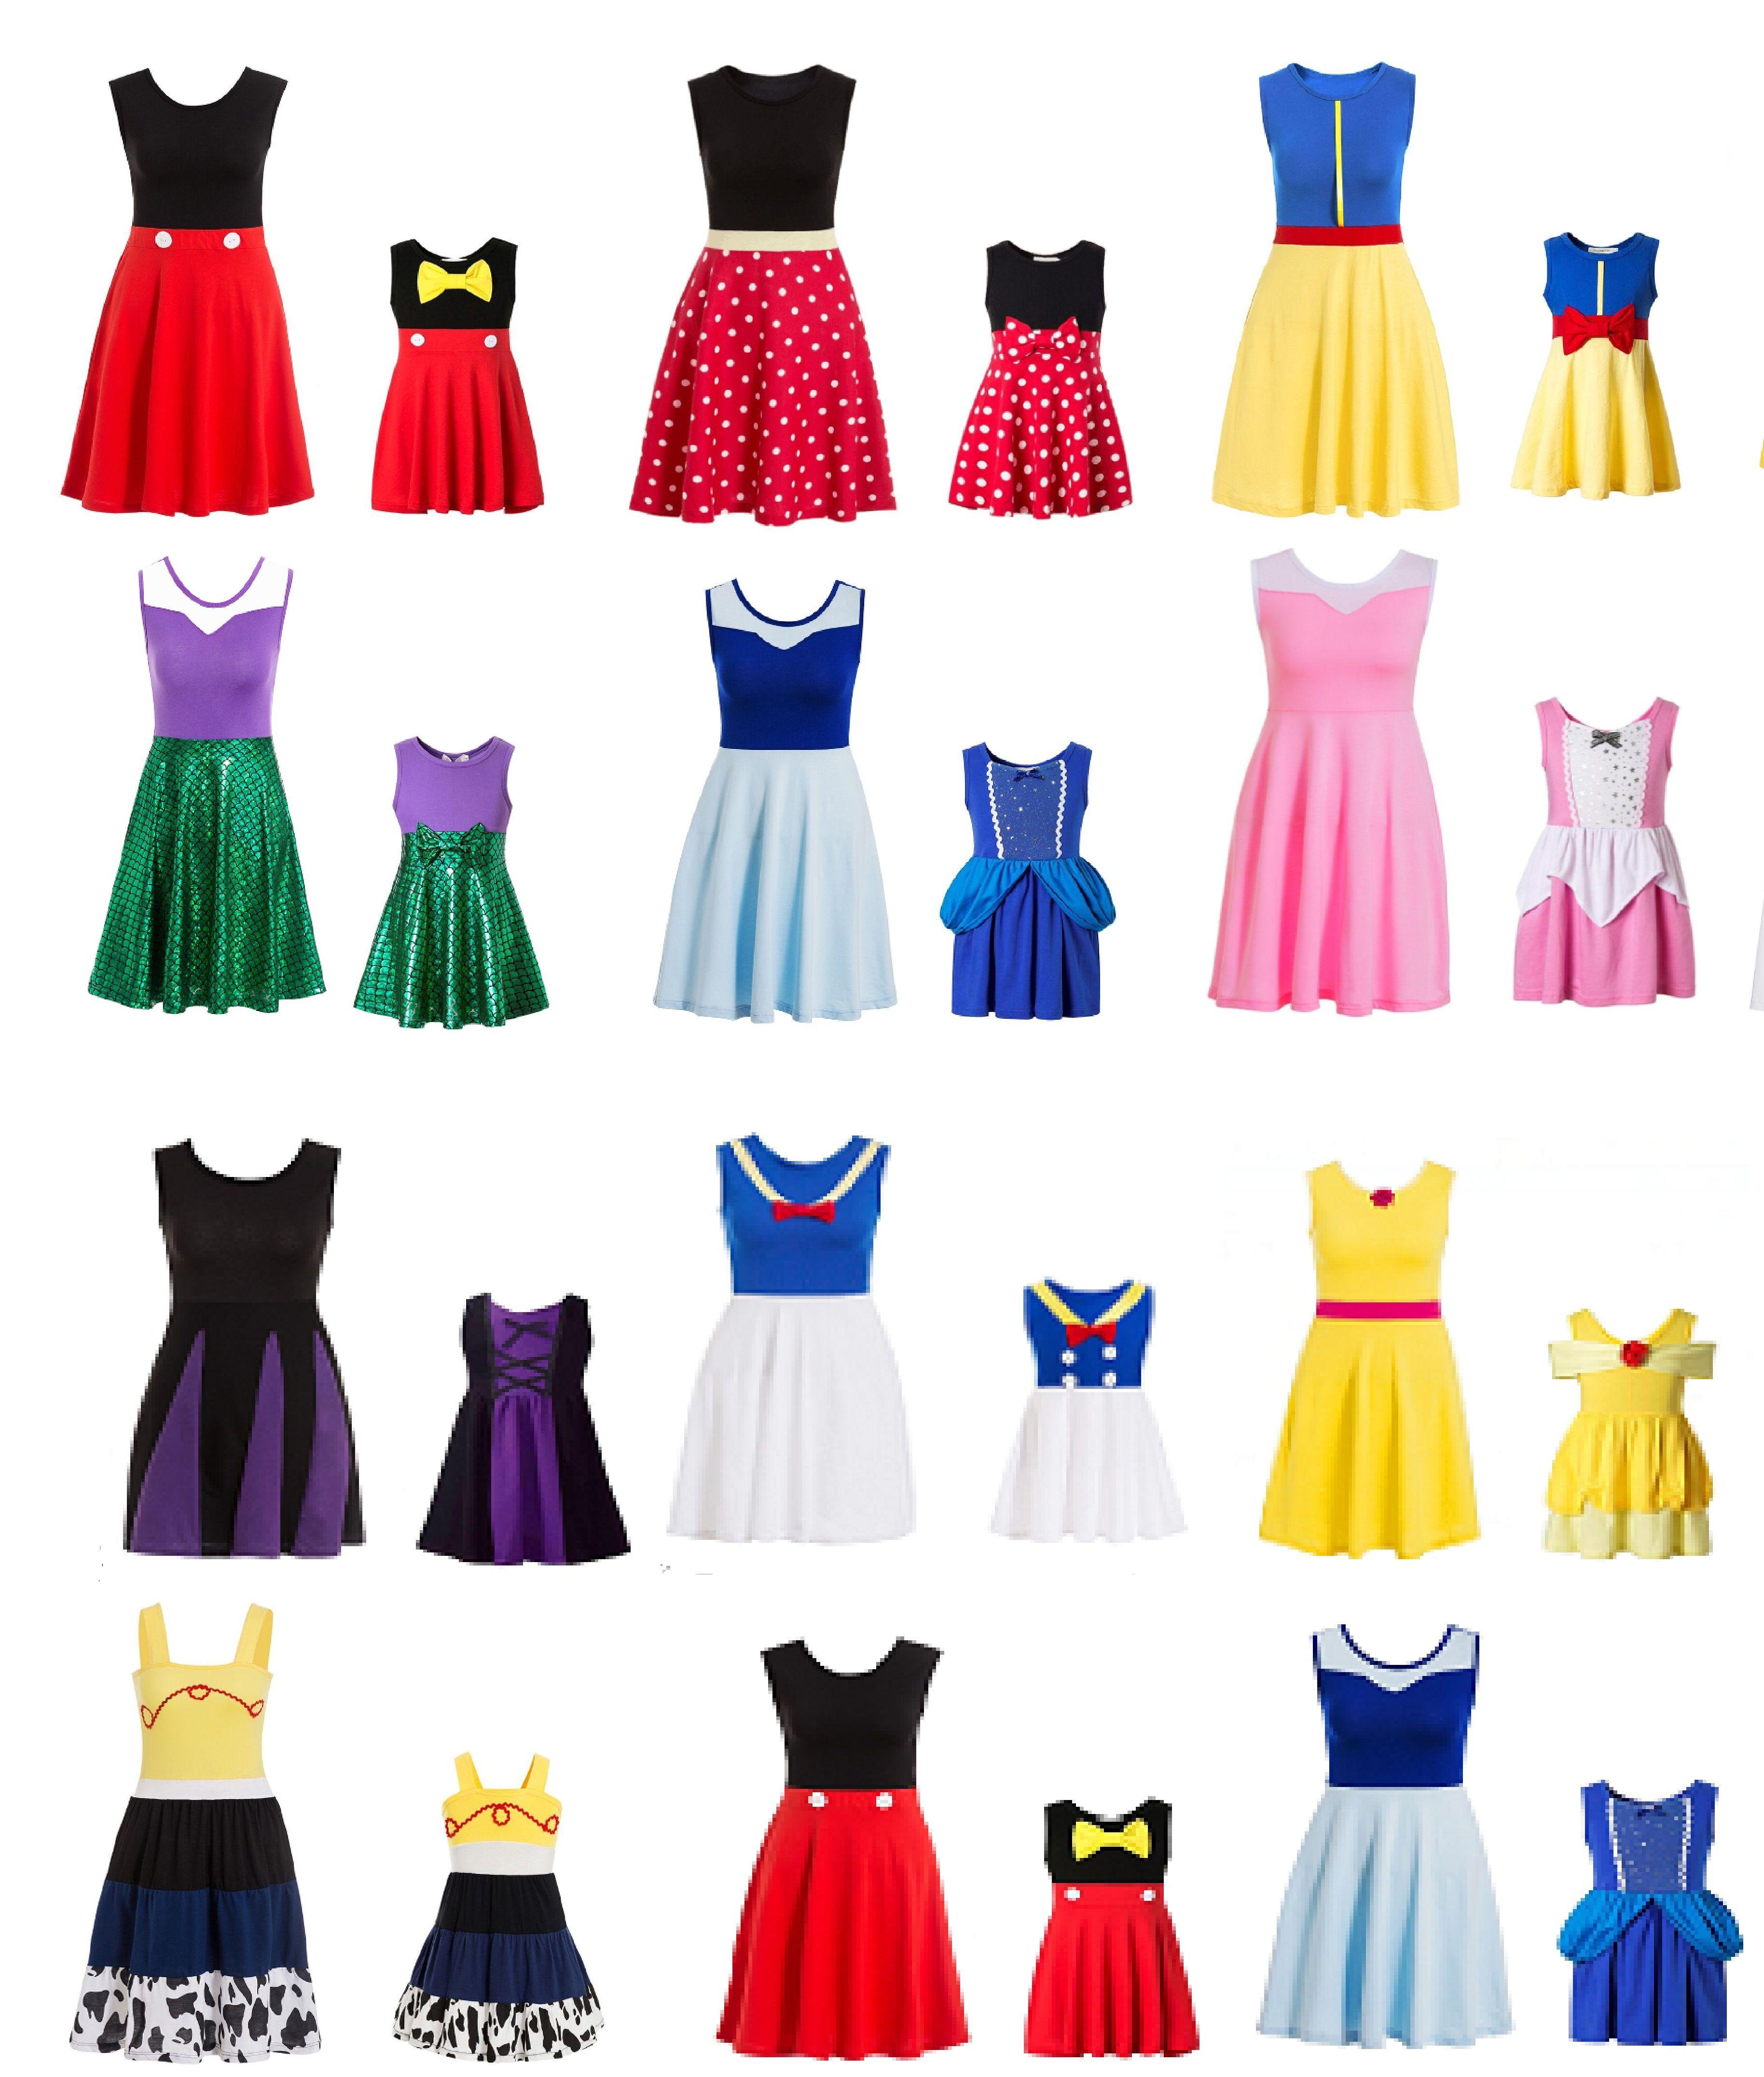 Taille adulte maman robe de princesse Minnie maman et moi correspondant famille cosplay Costume grande taille robe de princesse femme à pois